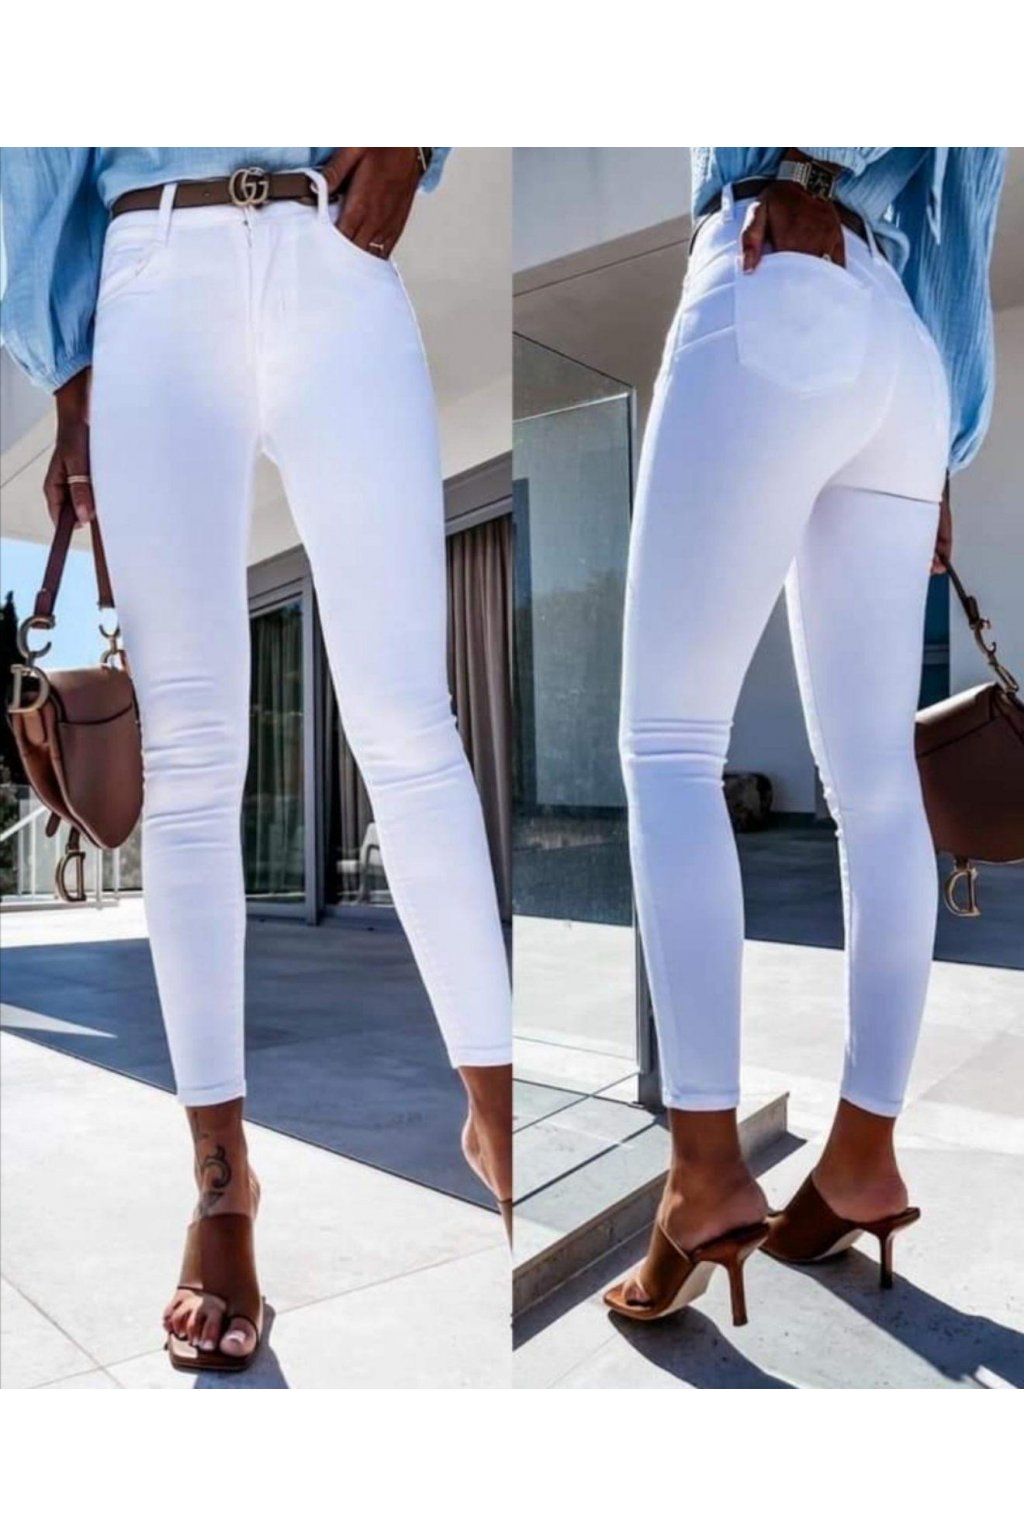 JEANS bílé trendy elastické jednoduché